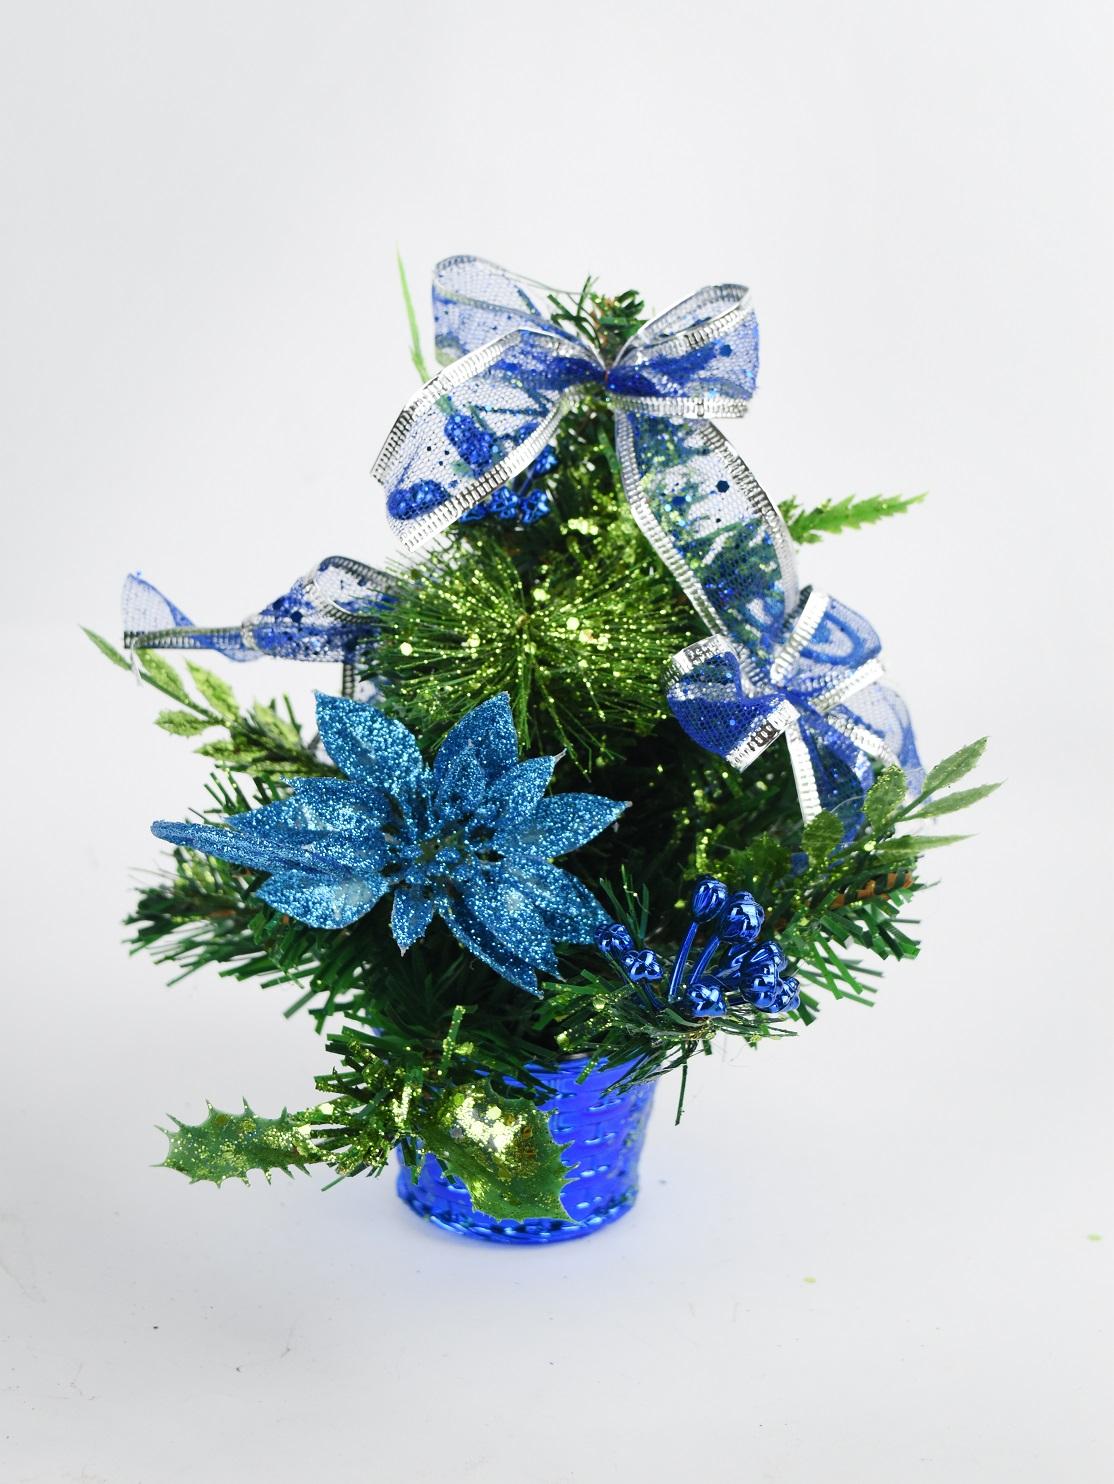 X射線【X454042】20cm裝飾聖誕樹(藍),聖誕樹/聖誕佈置/聖誕燈/會場佈置/材料包/成品樹/小樹